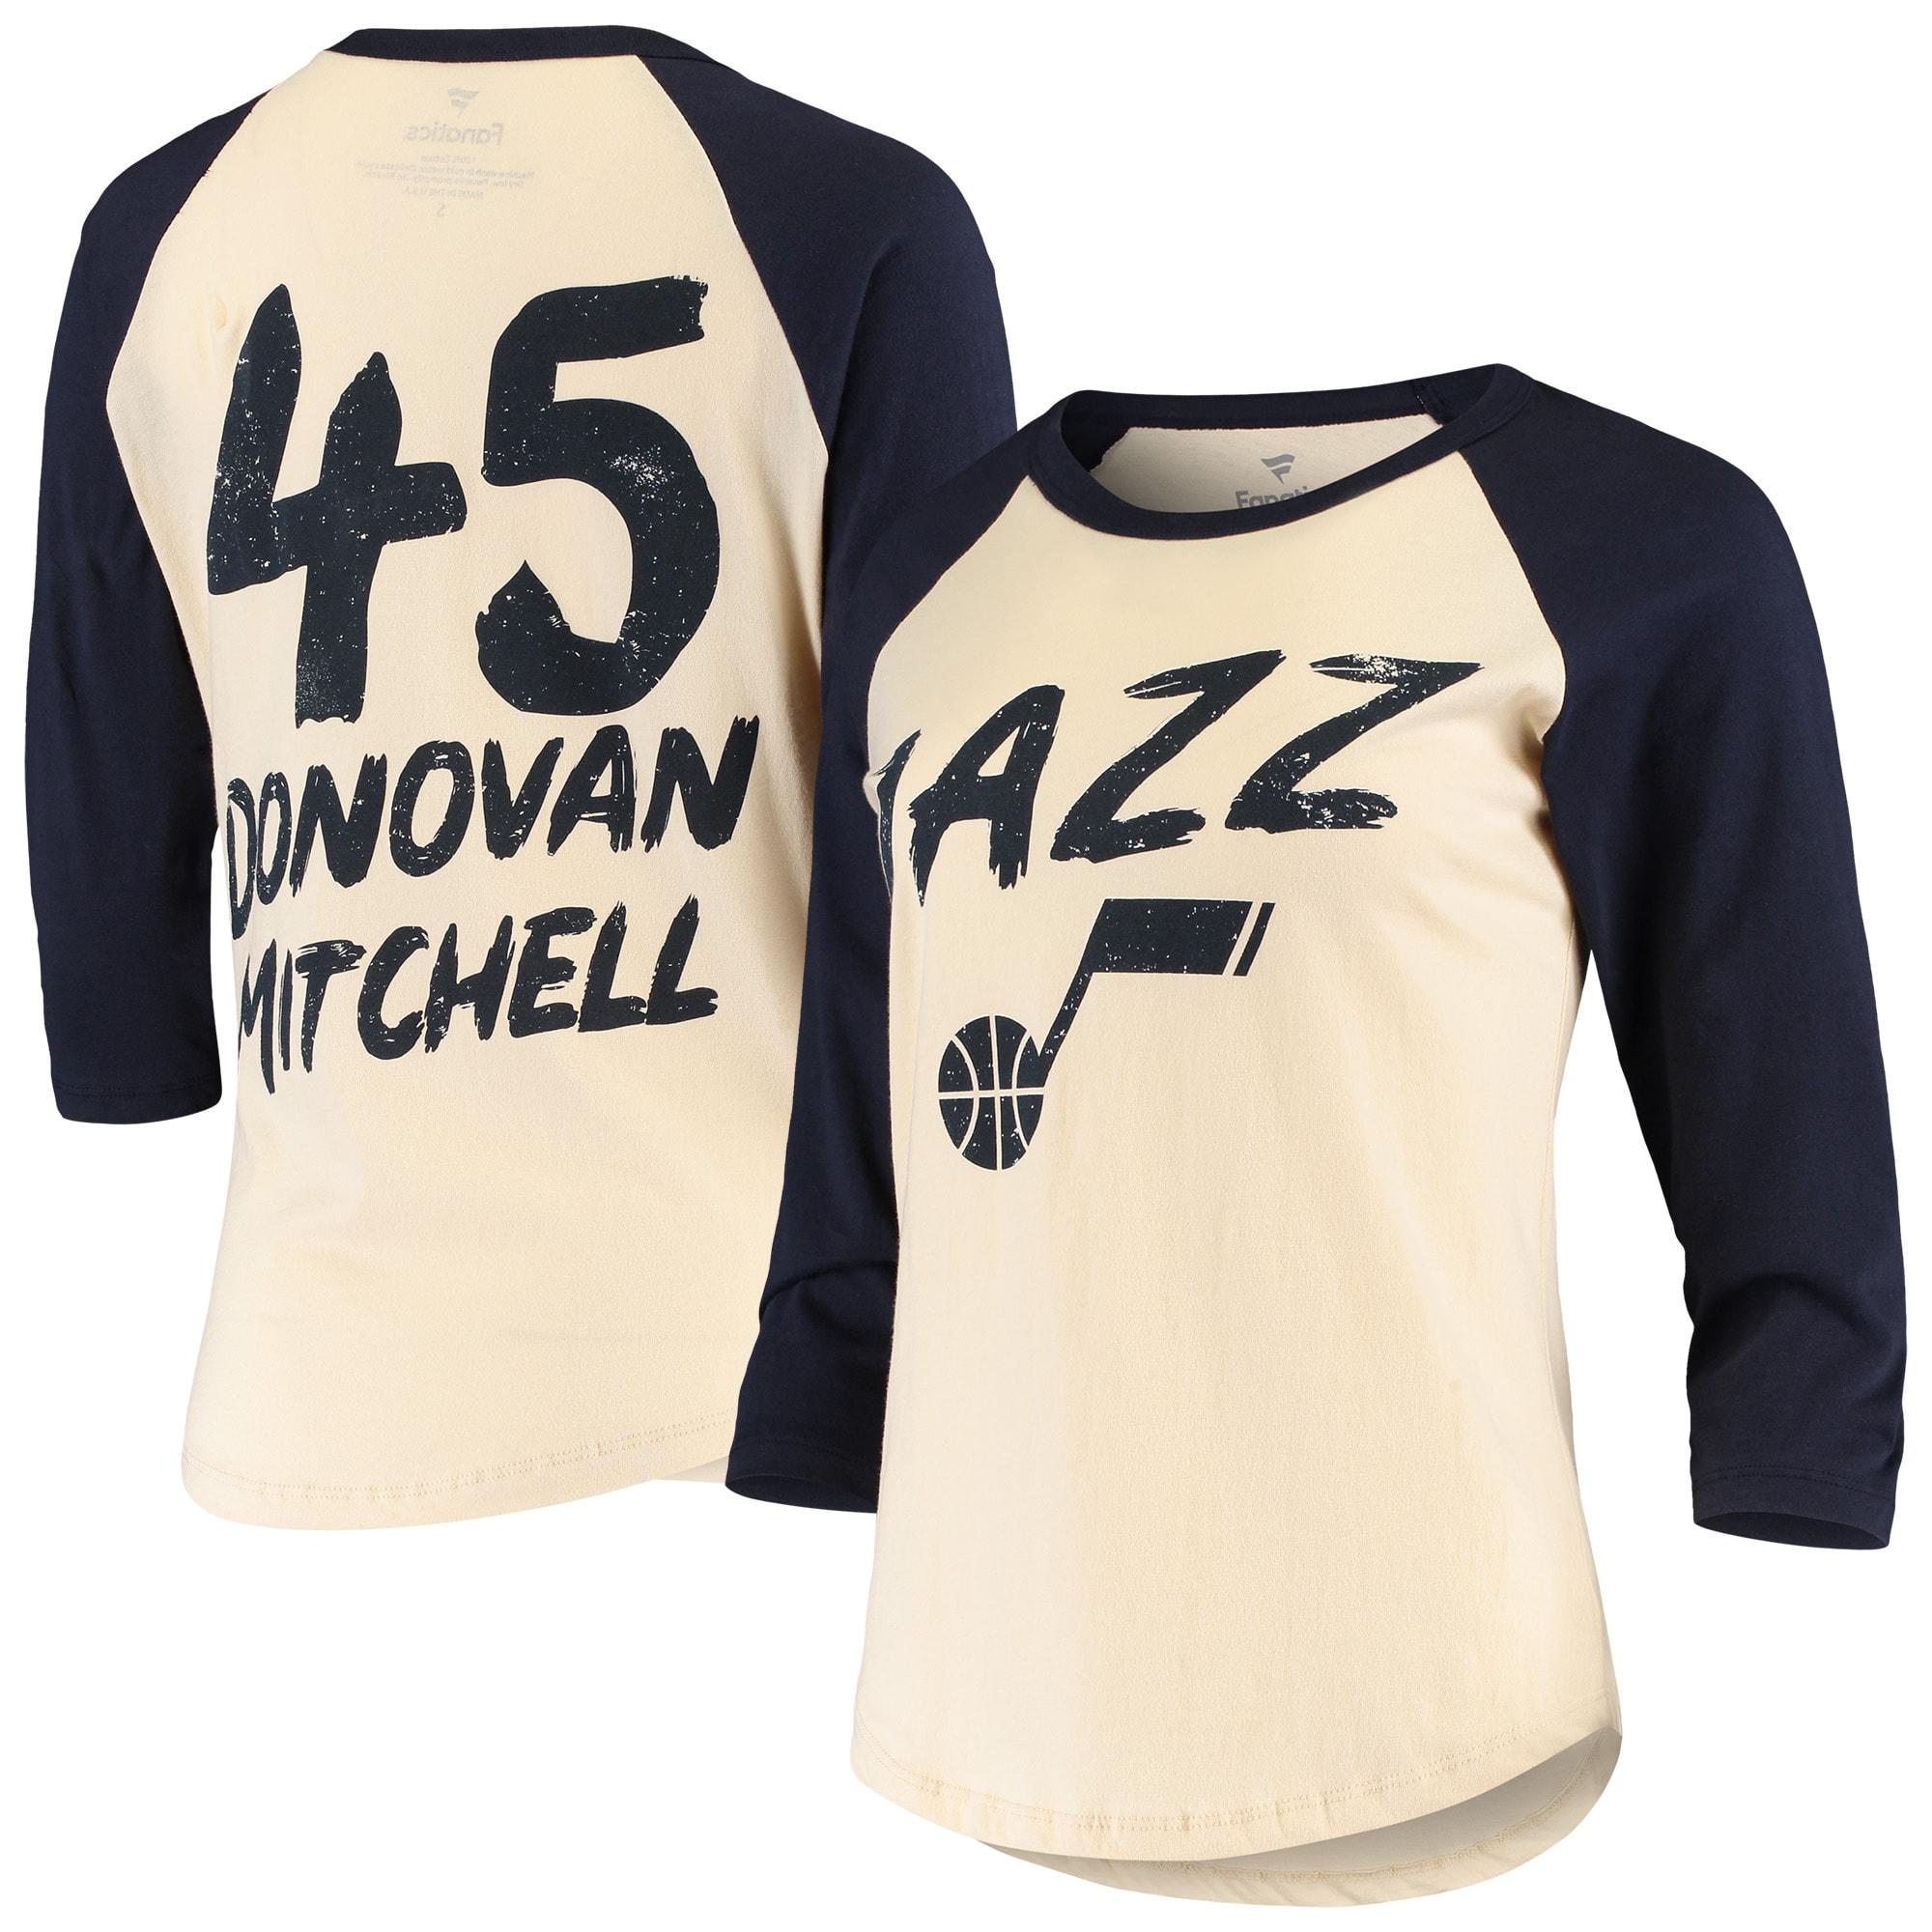 Donovan Mitchell Utah Jazz Fanatics Branded Women's Raglan 3/4-Sleeve T-Shirt - Cream